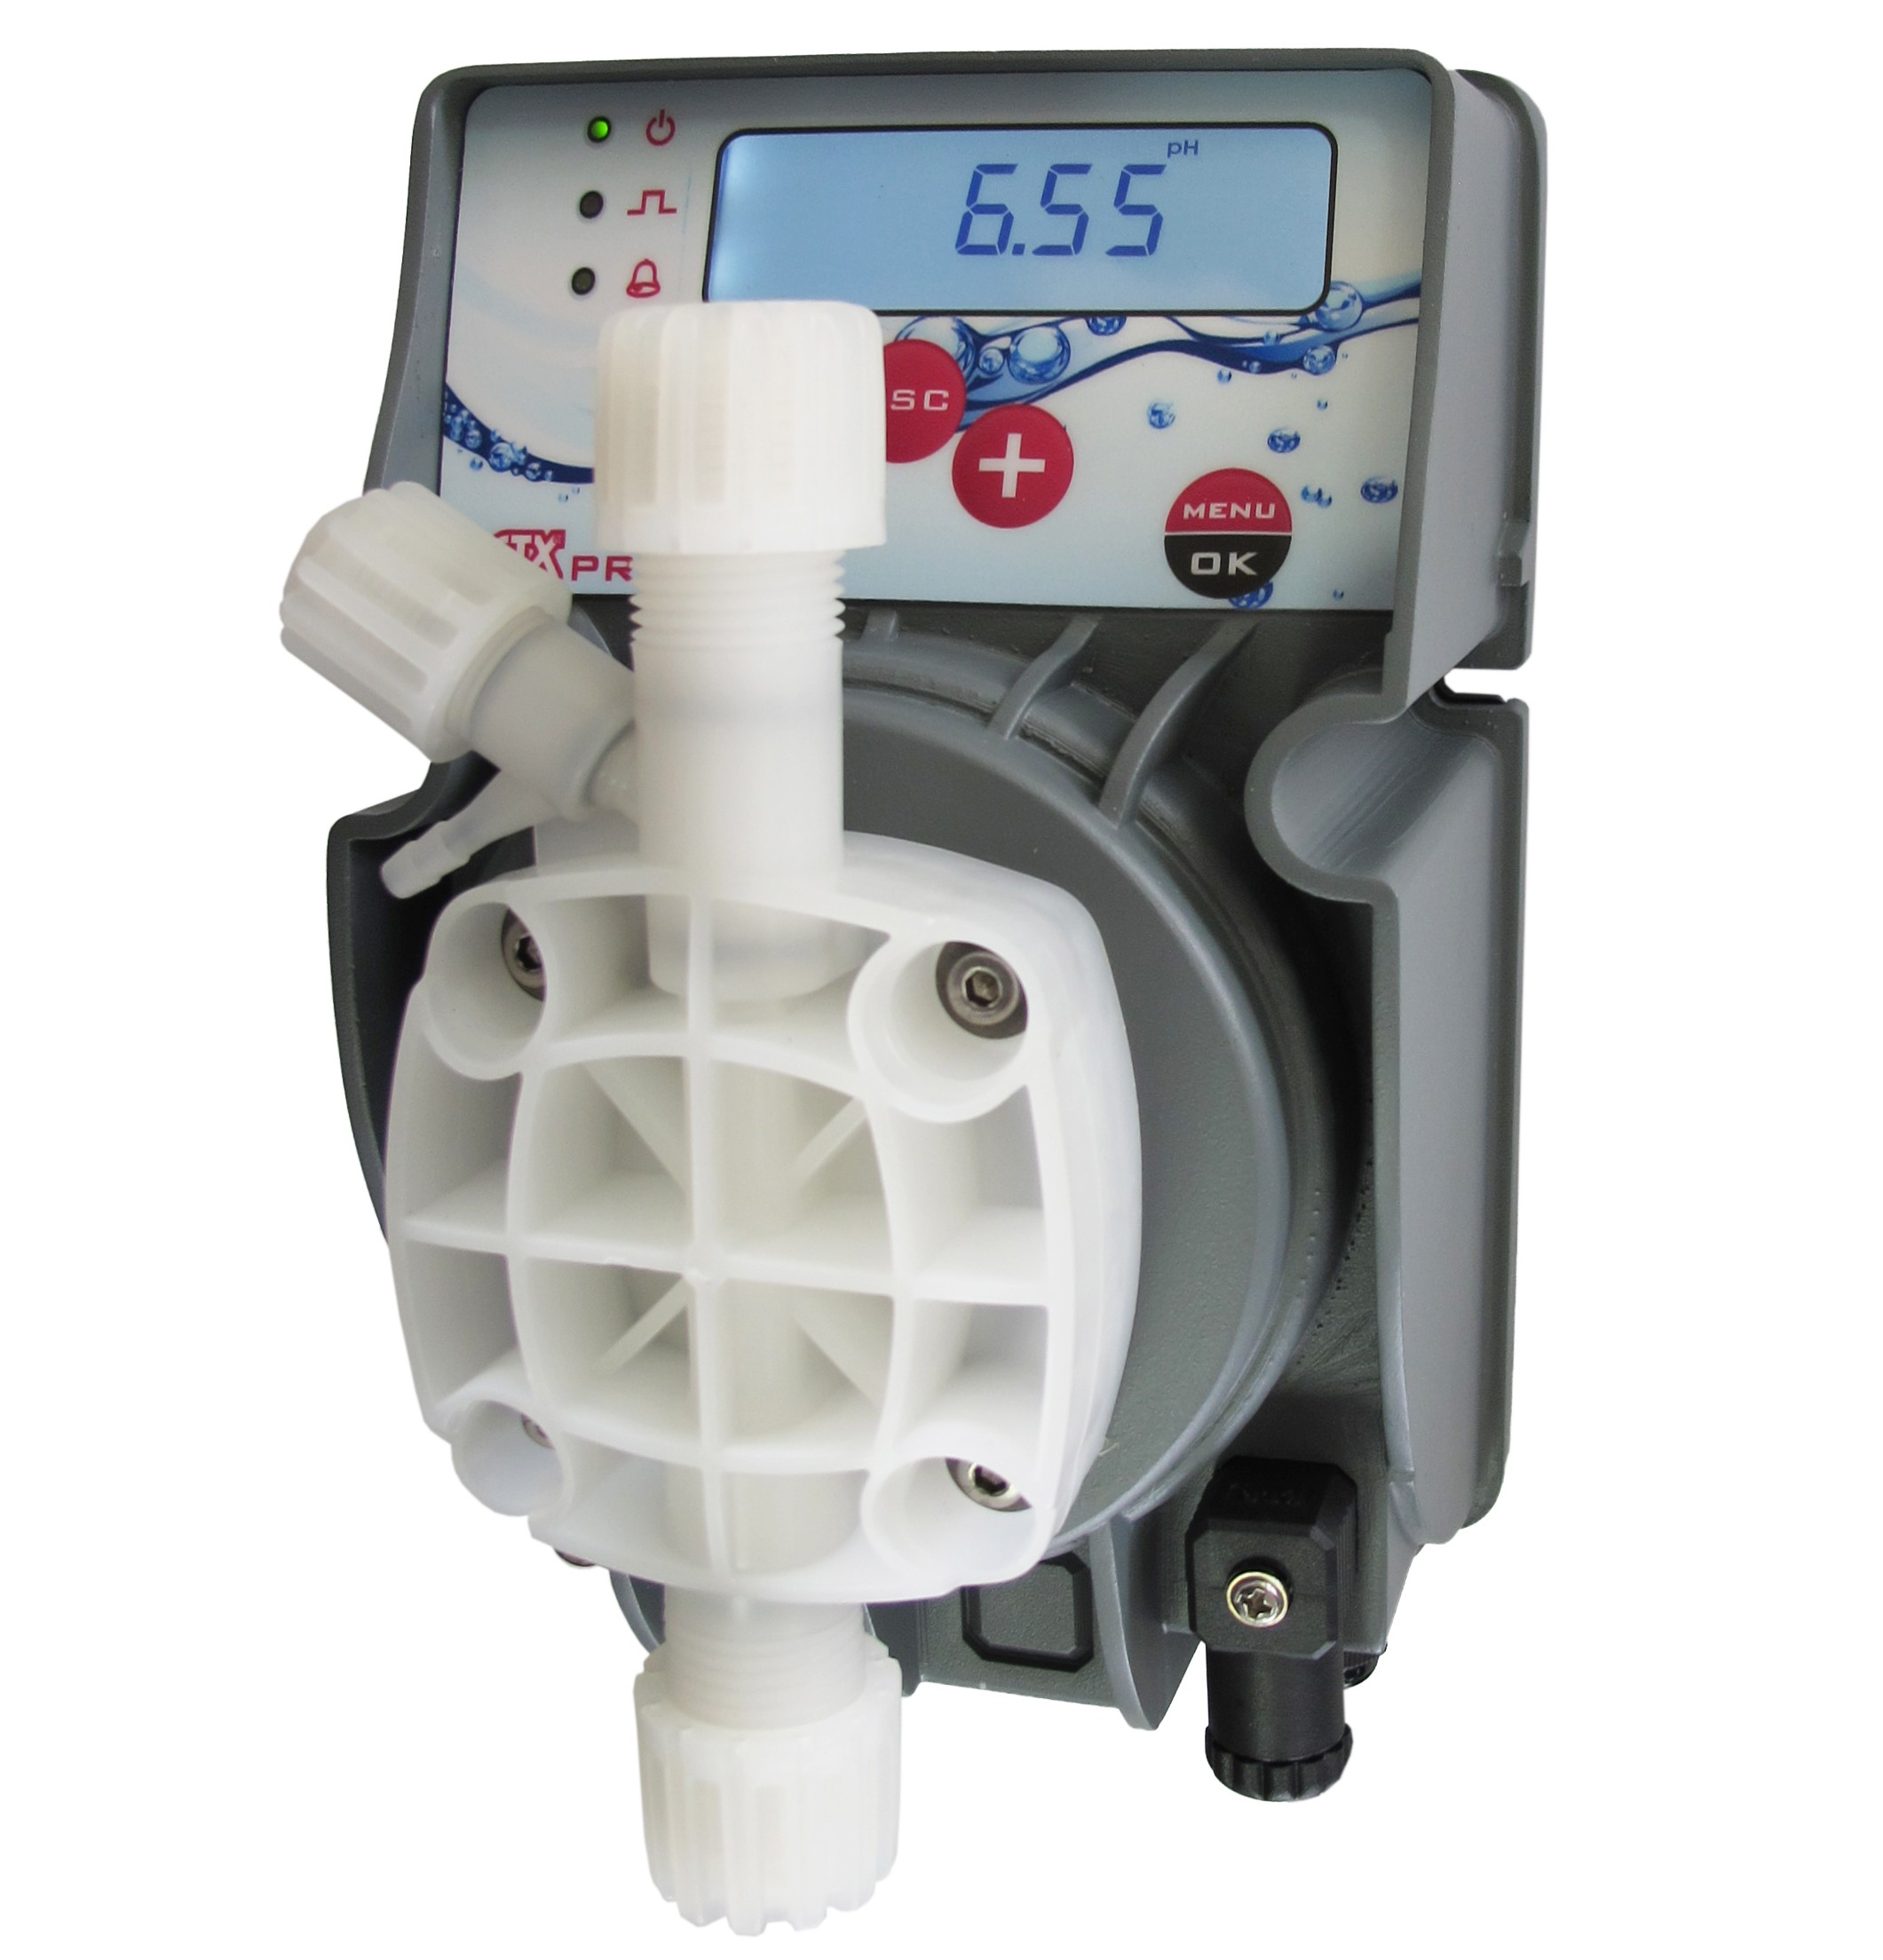 Ctx bomba dosificadora pro ph rx de membrana piscinas for Bomba dosificadora de ph para piscinas